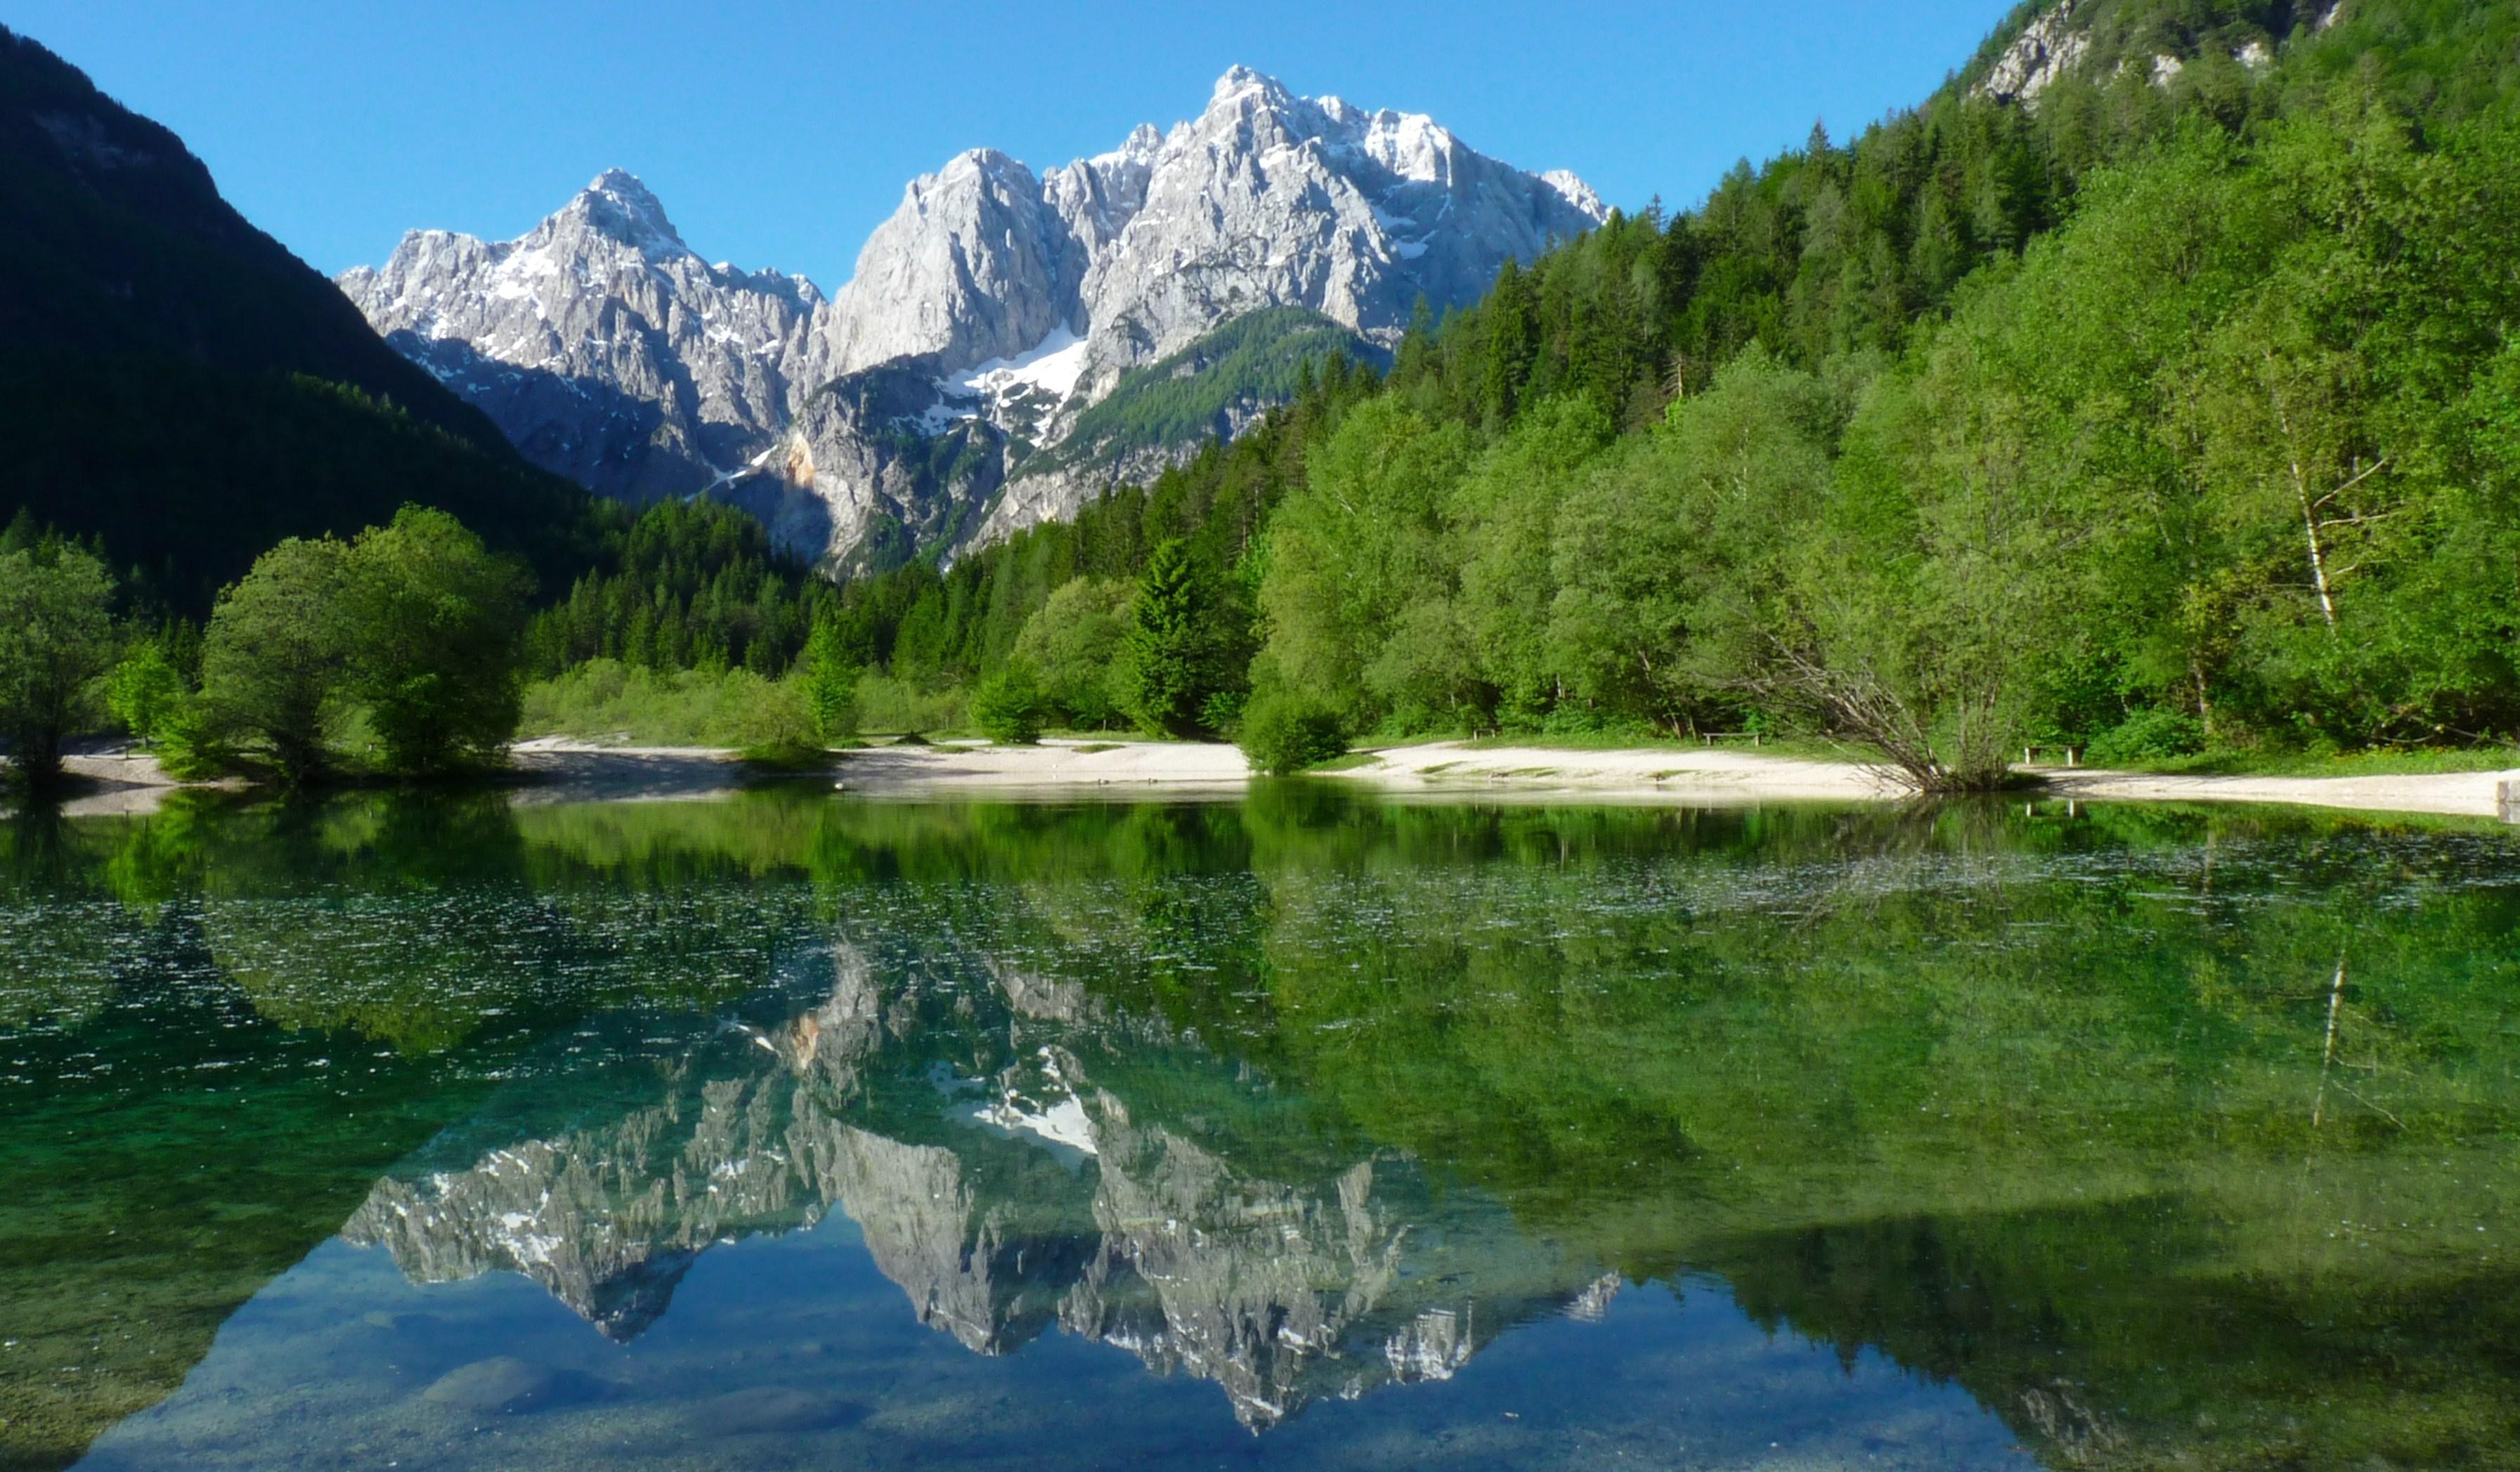 Onze volgende reis: Slovenië!